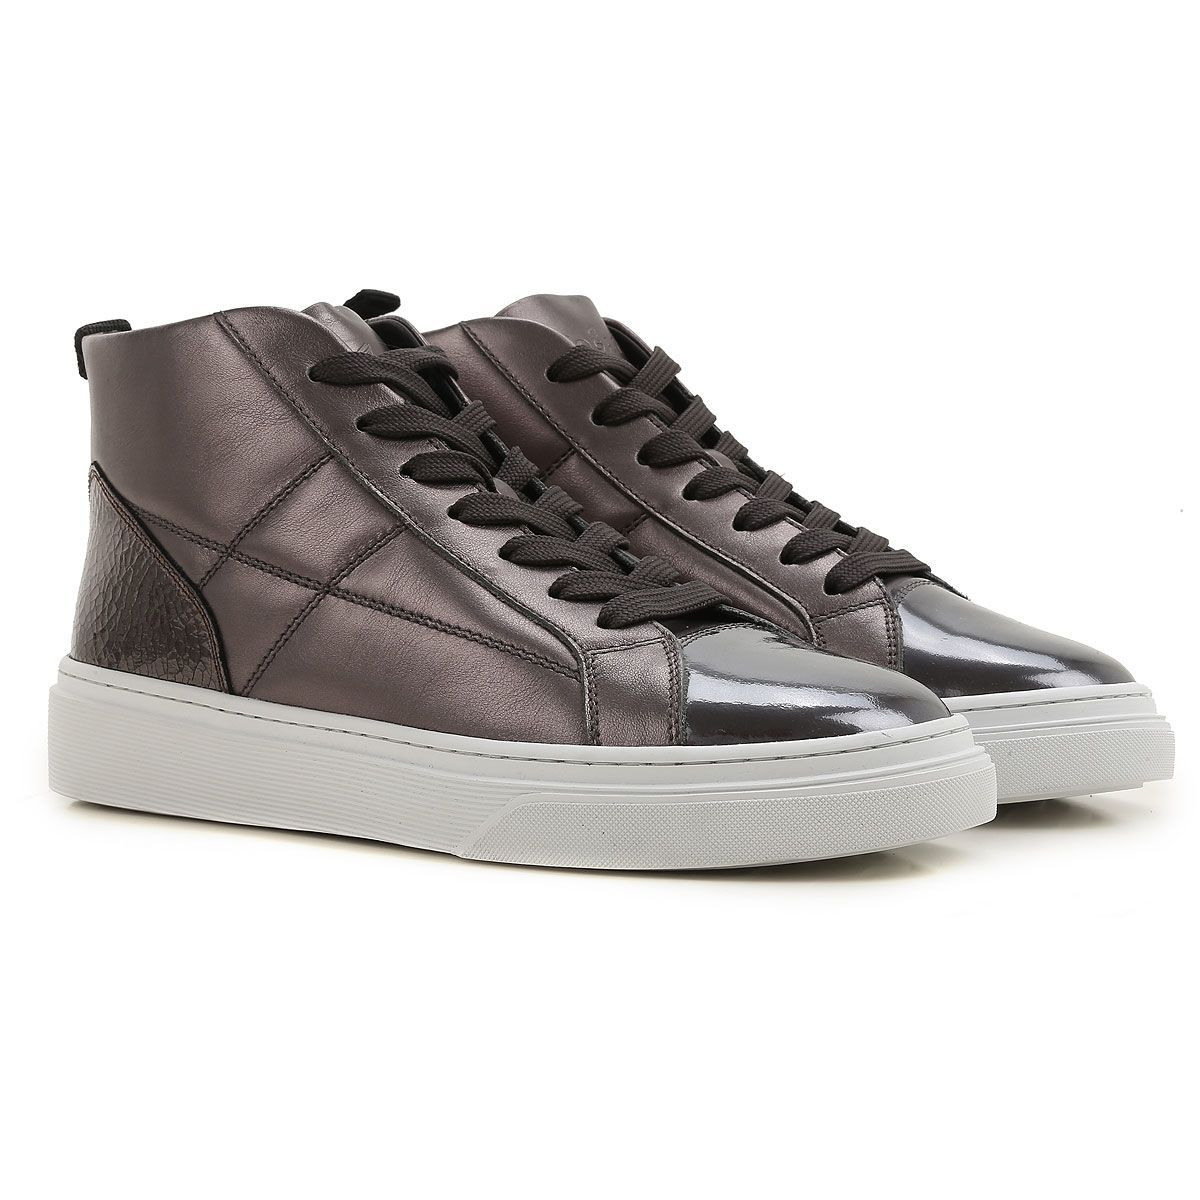 HOGAN   Hogan Sneakers H342 #Shoes #Sneakers #HOGAN   Hogan ...